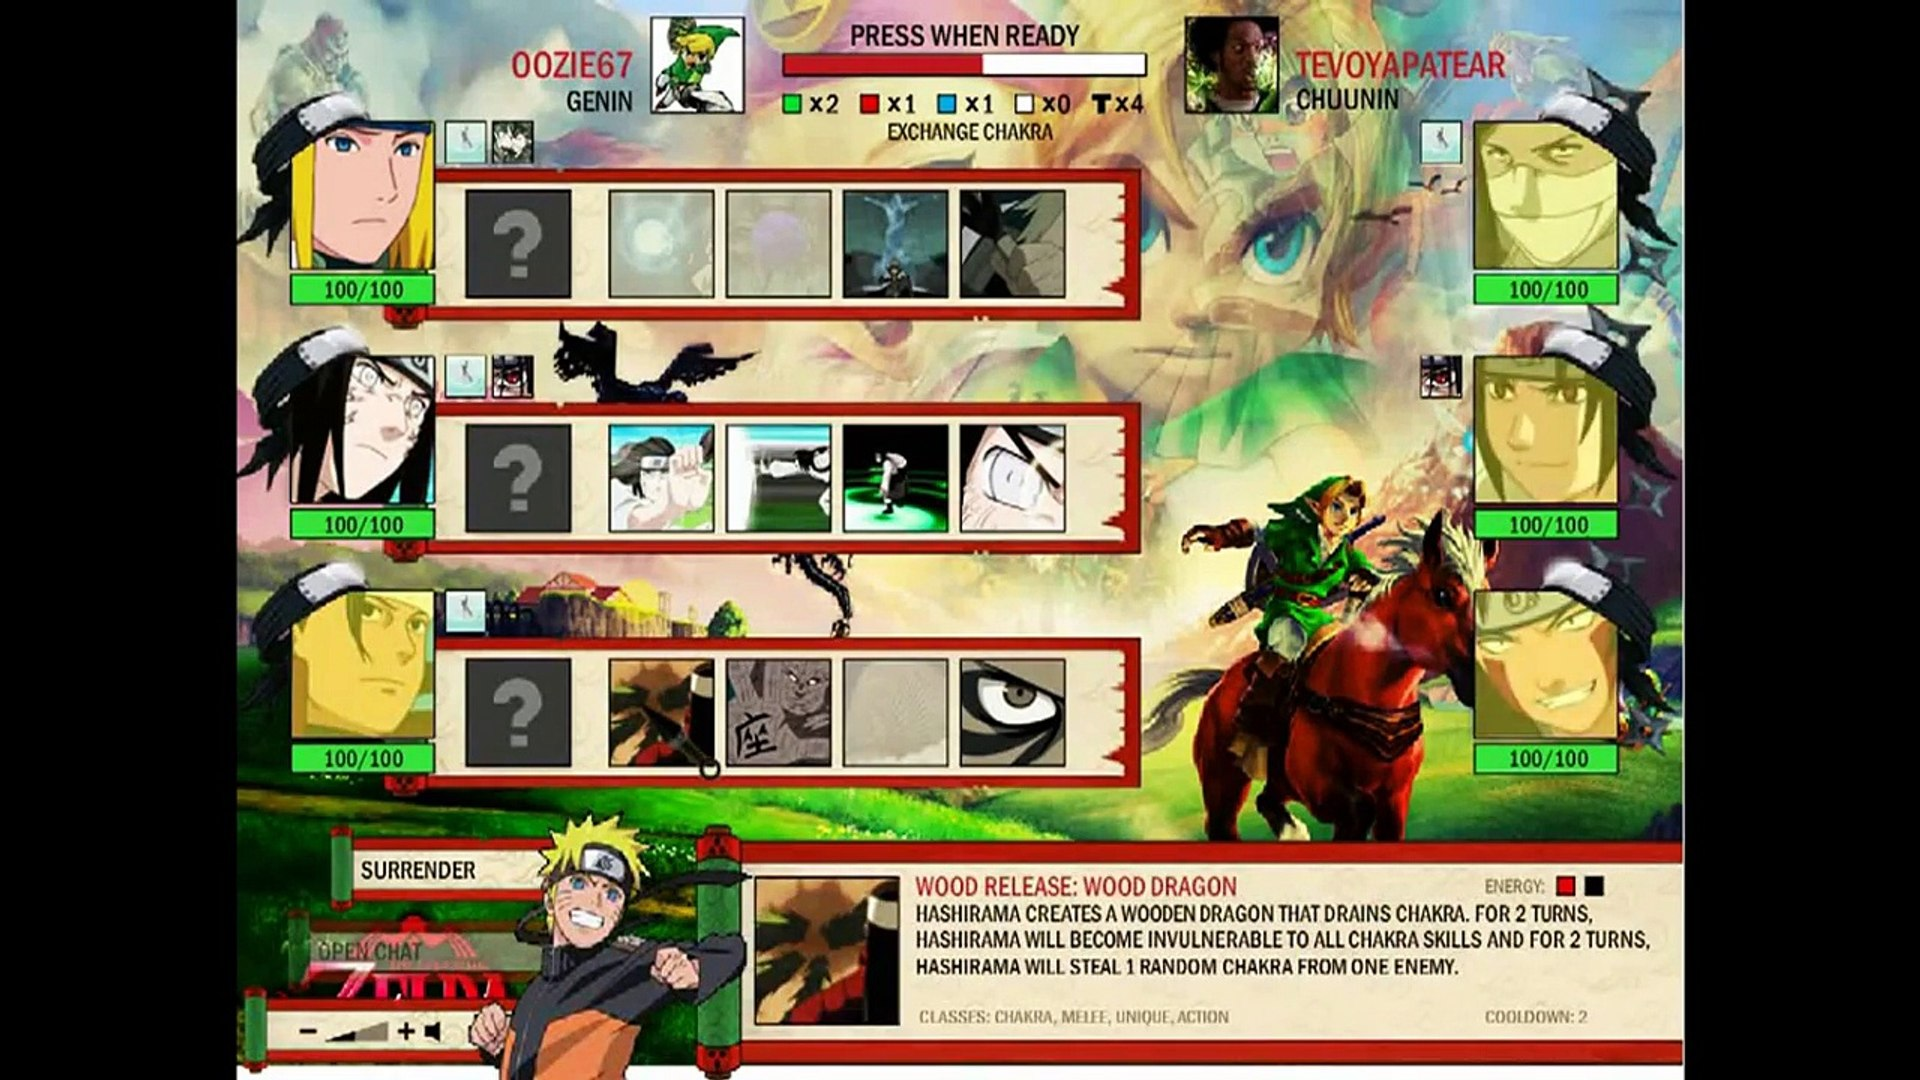 Naruto Arena Streak Team 1/29/16